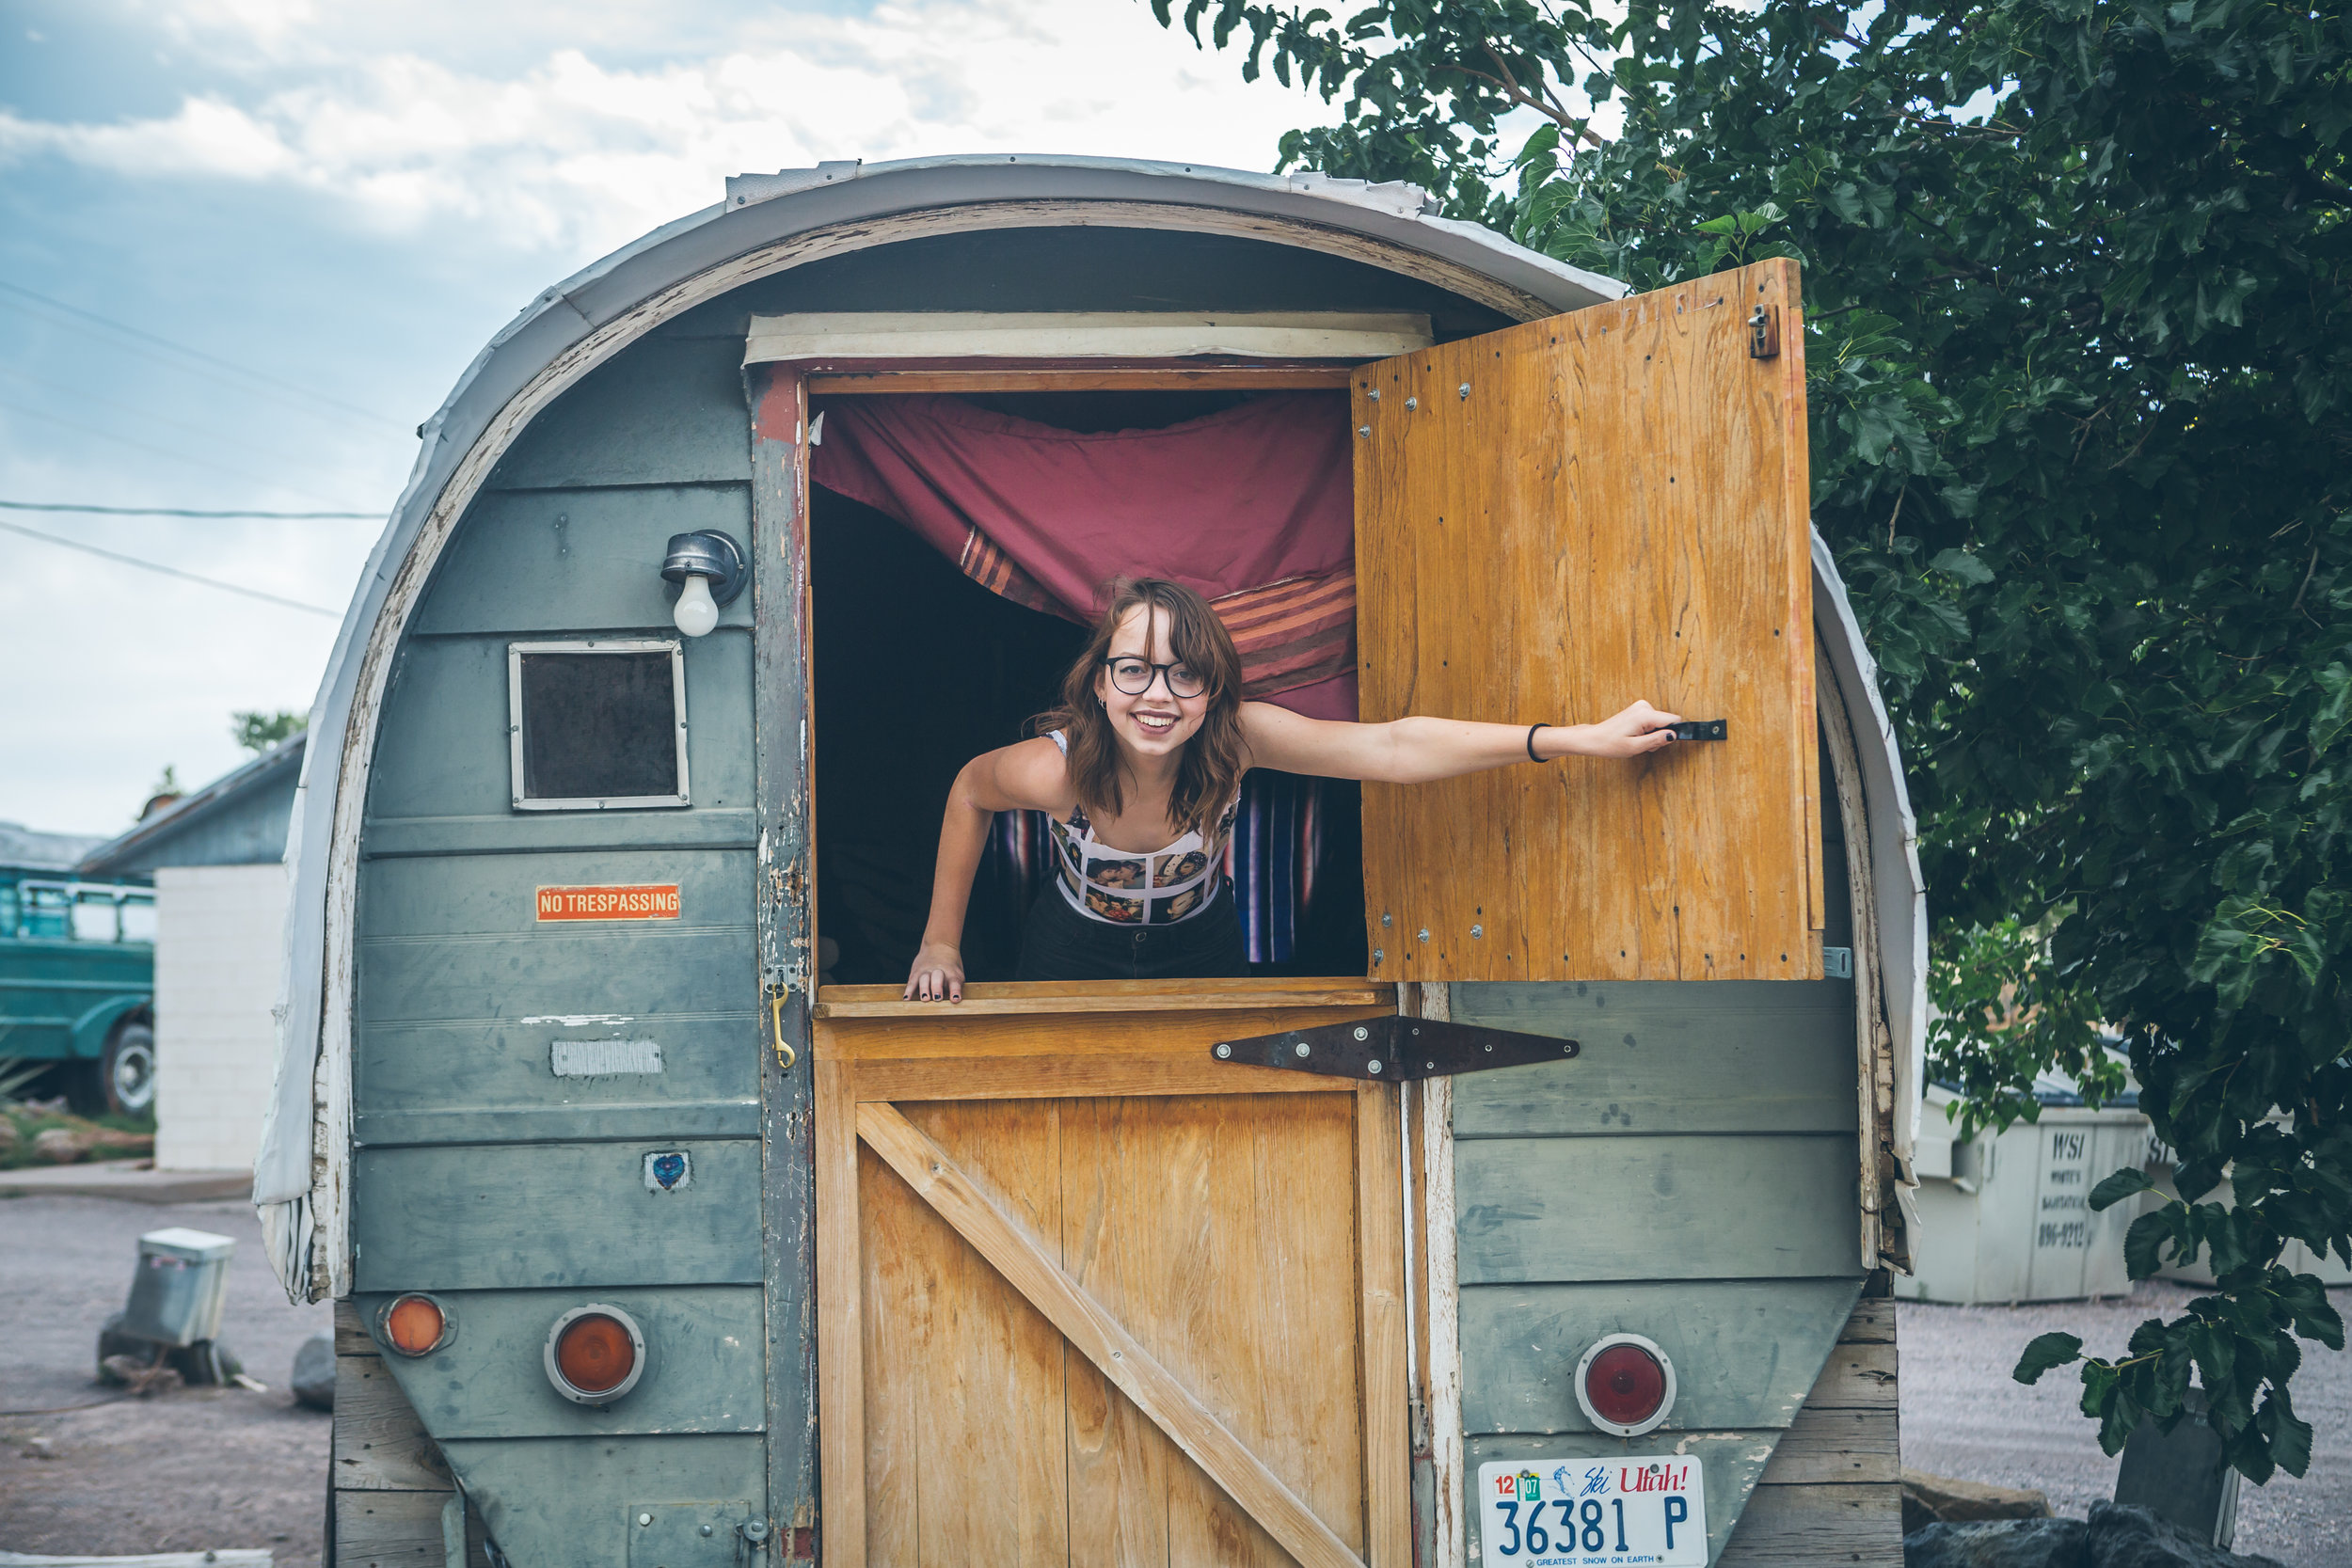 2017-08-07 Mystic Hot Springs Brooke Alyssa-7.jpg